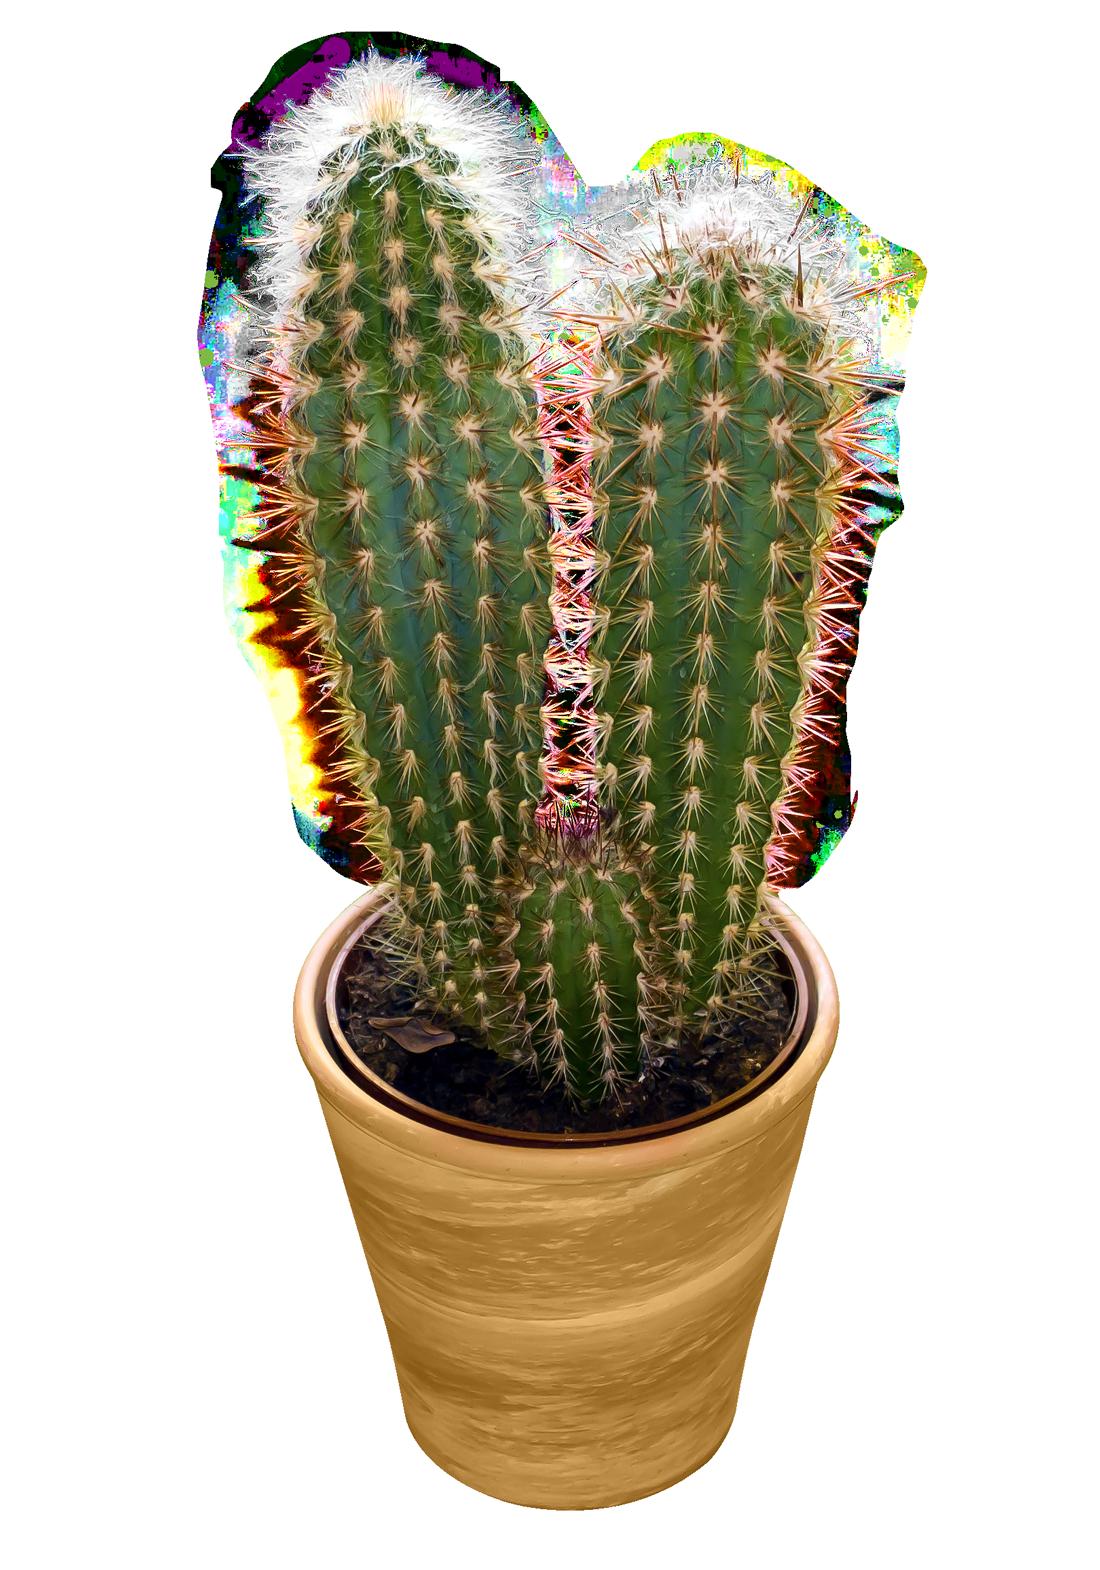 Cactus PNG Image